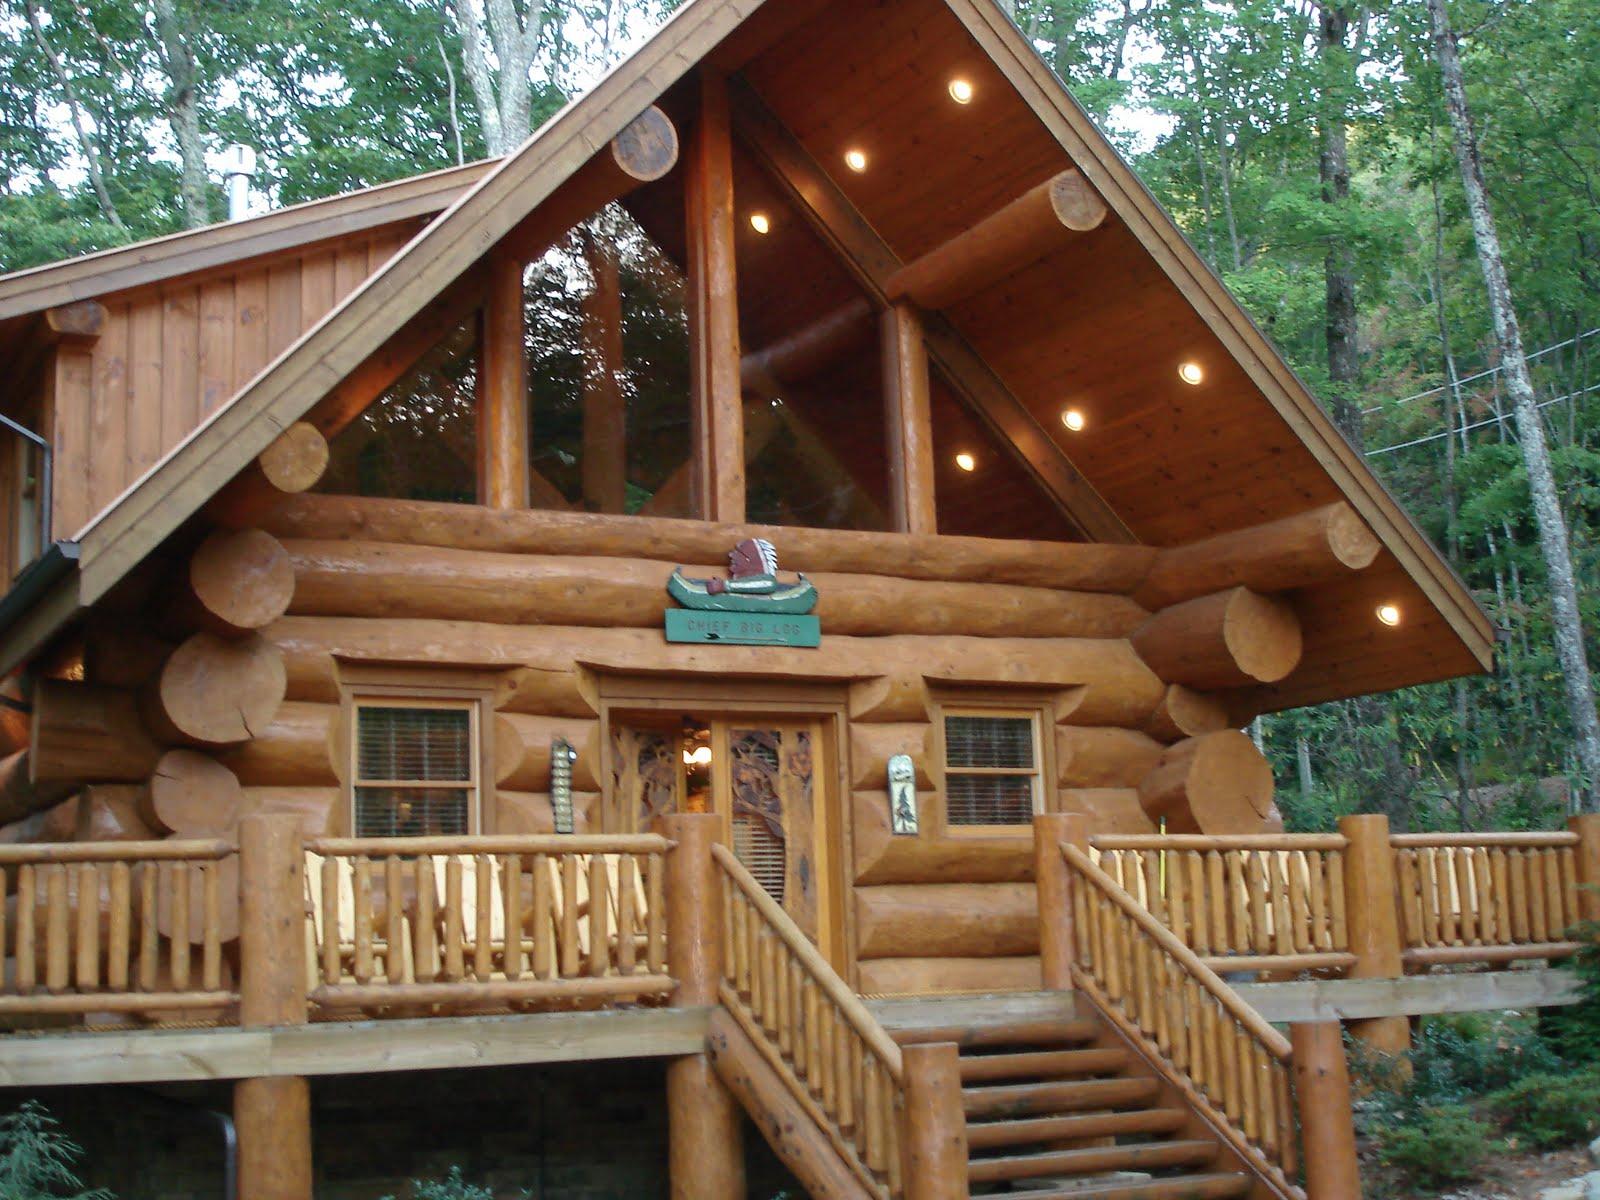 Gatlinburg cabin rentals favorite vacation ideas in the for Cabin rentals of gatlinburg